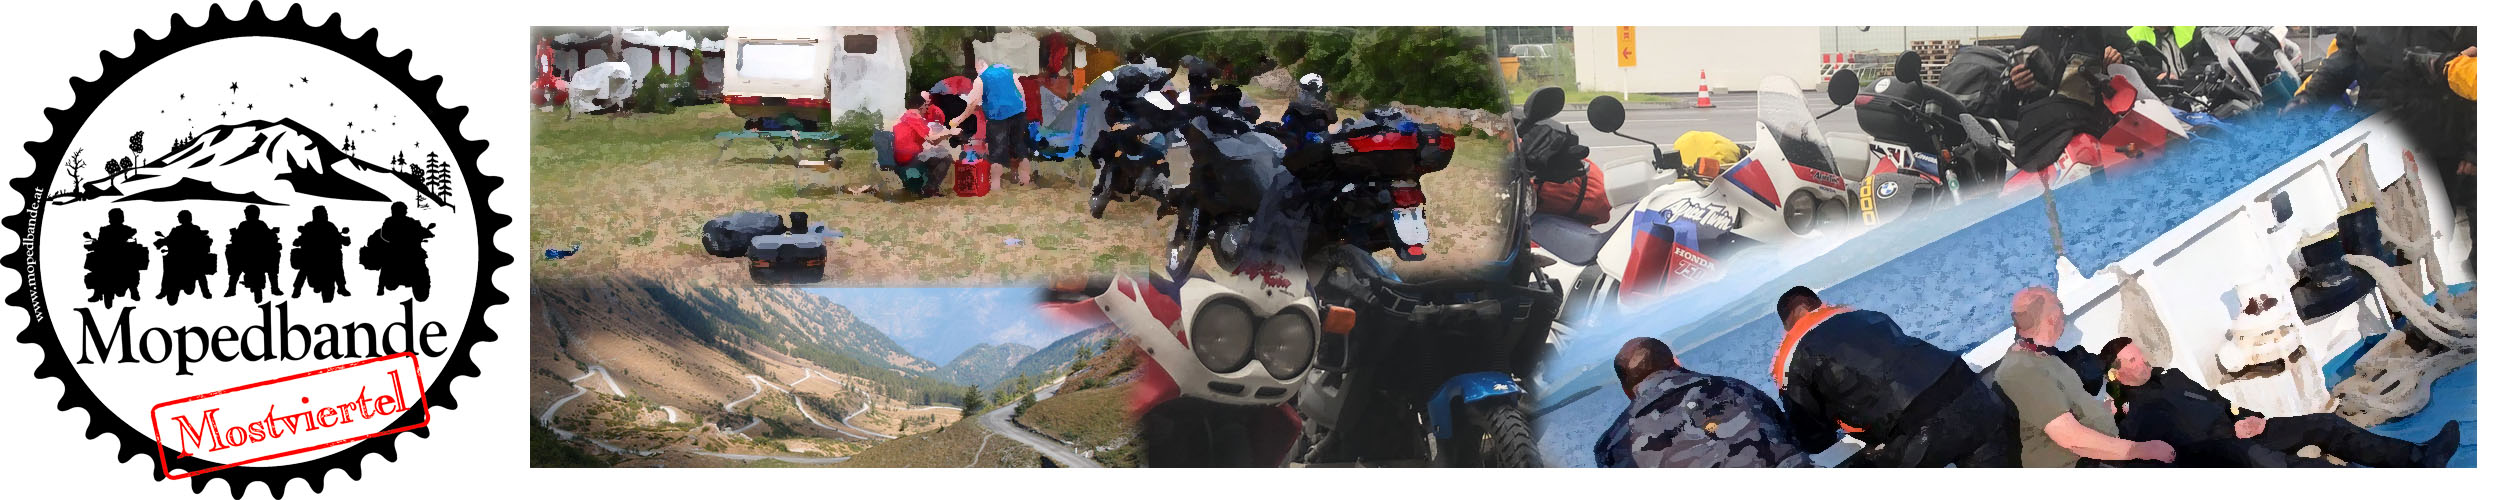 Mopedbande Mostviertel